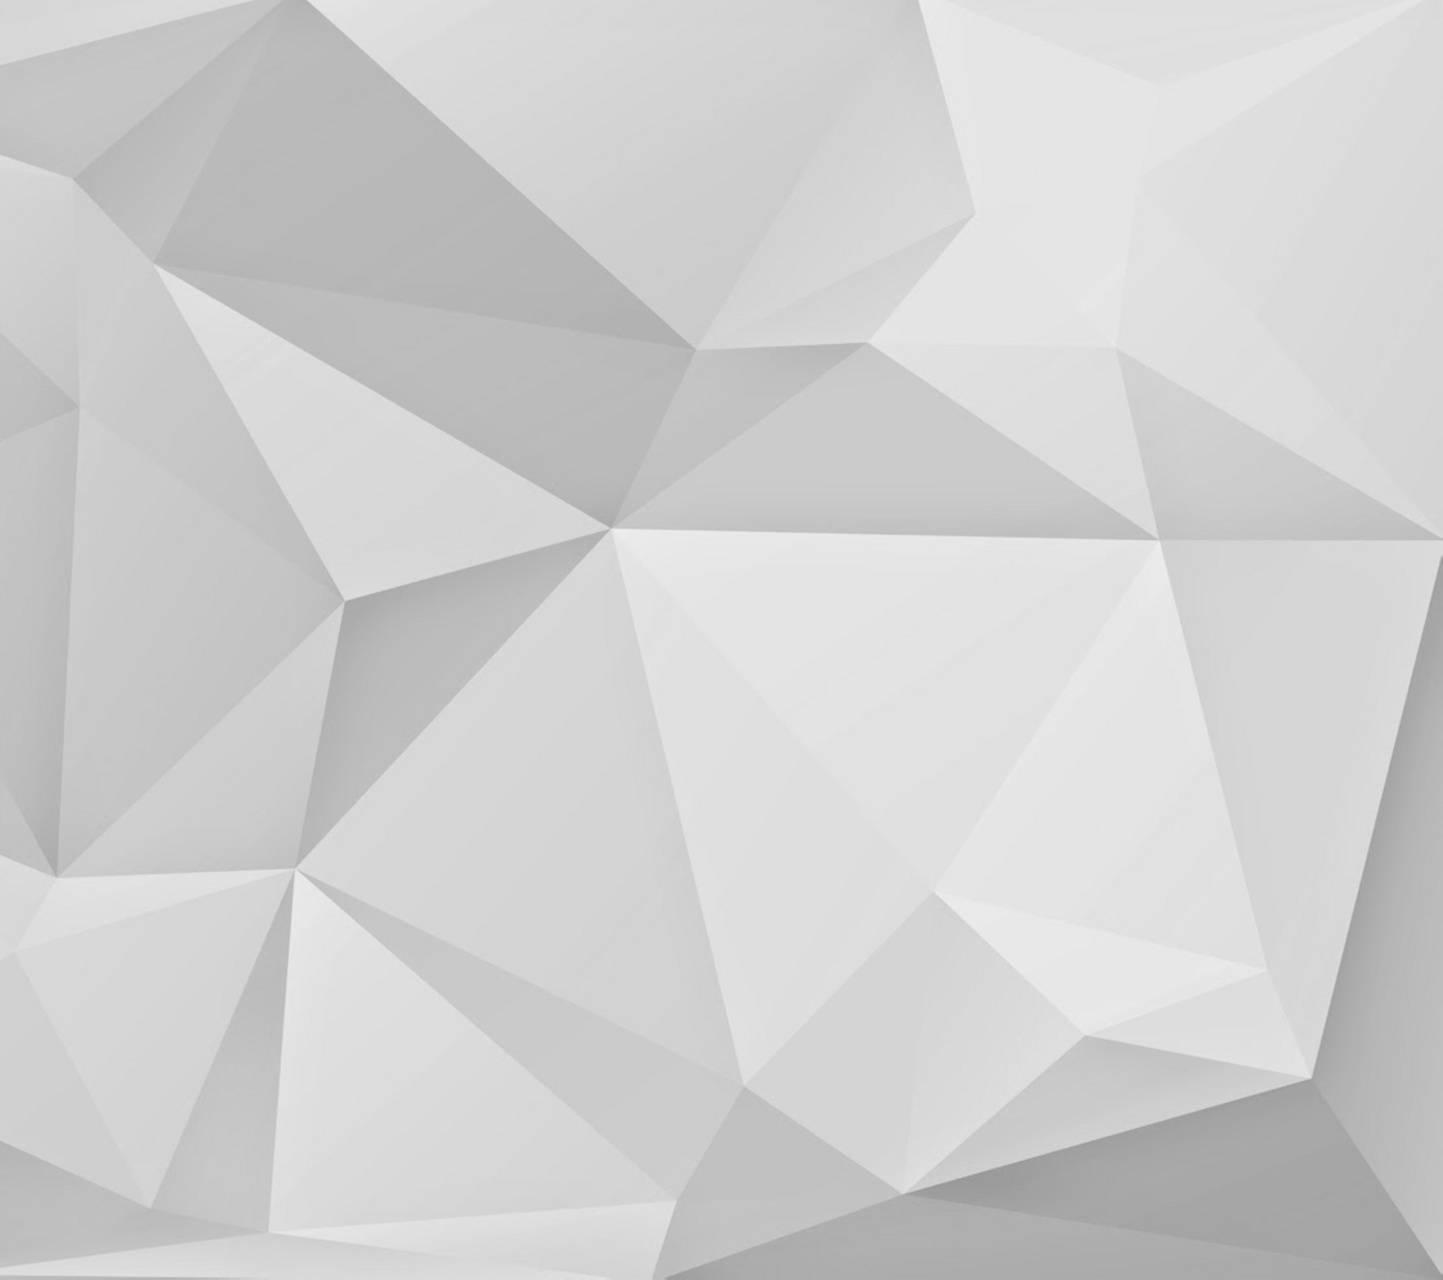 White Polygon